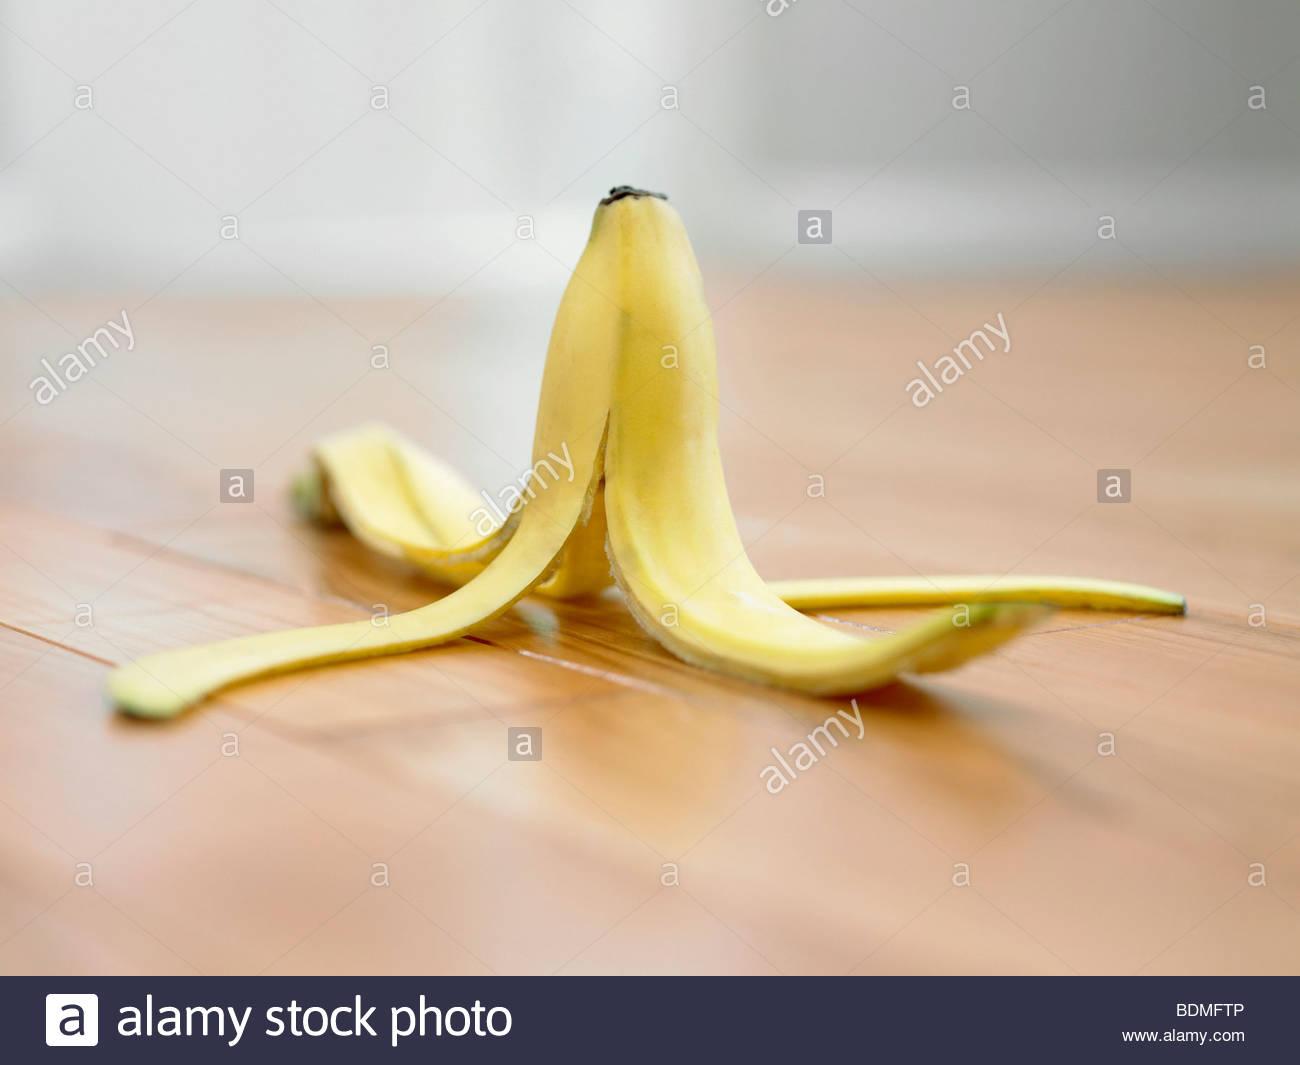 Bananenschale auf Holzboden Stockbild